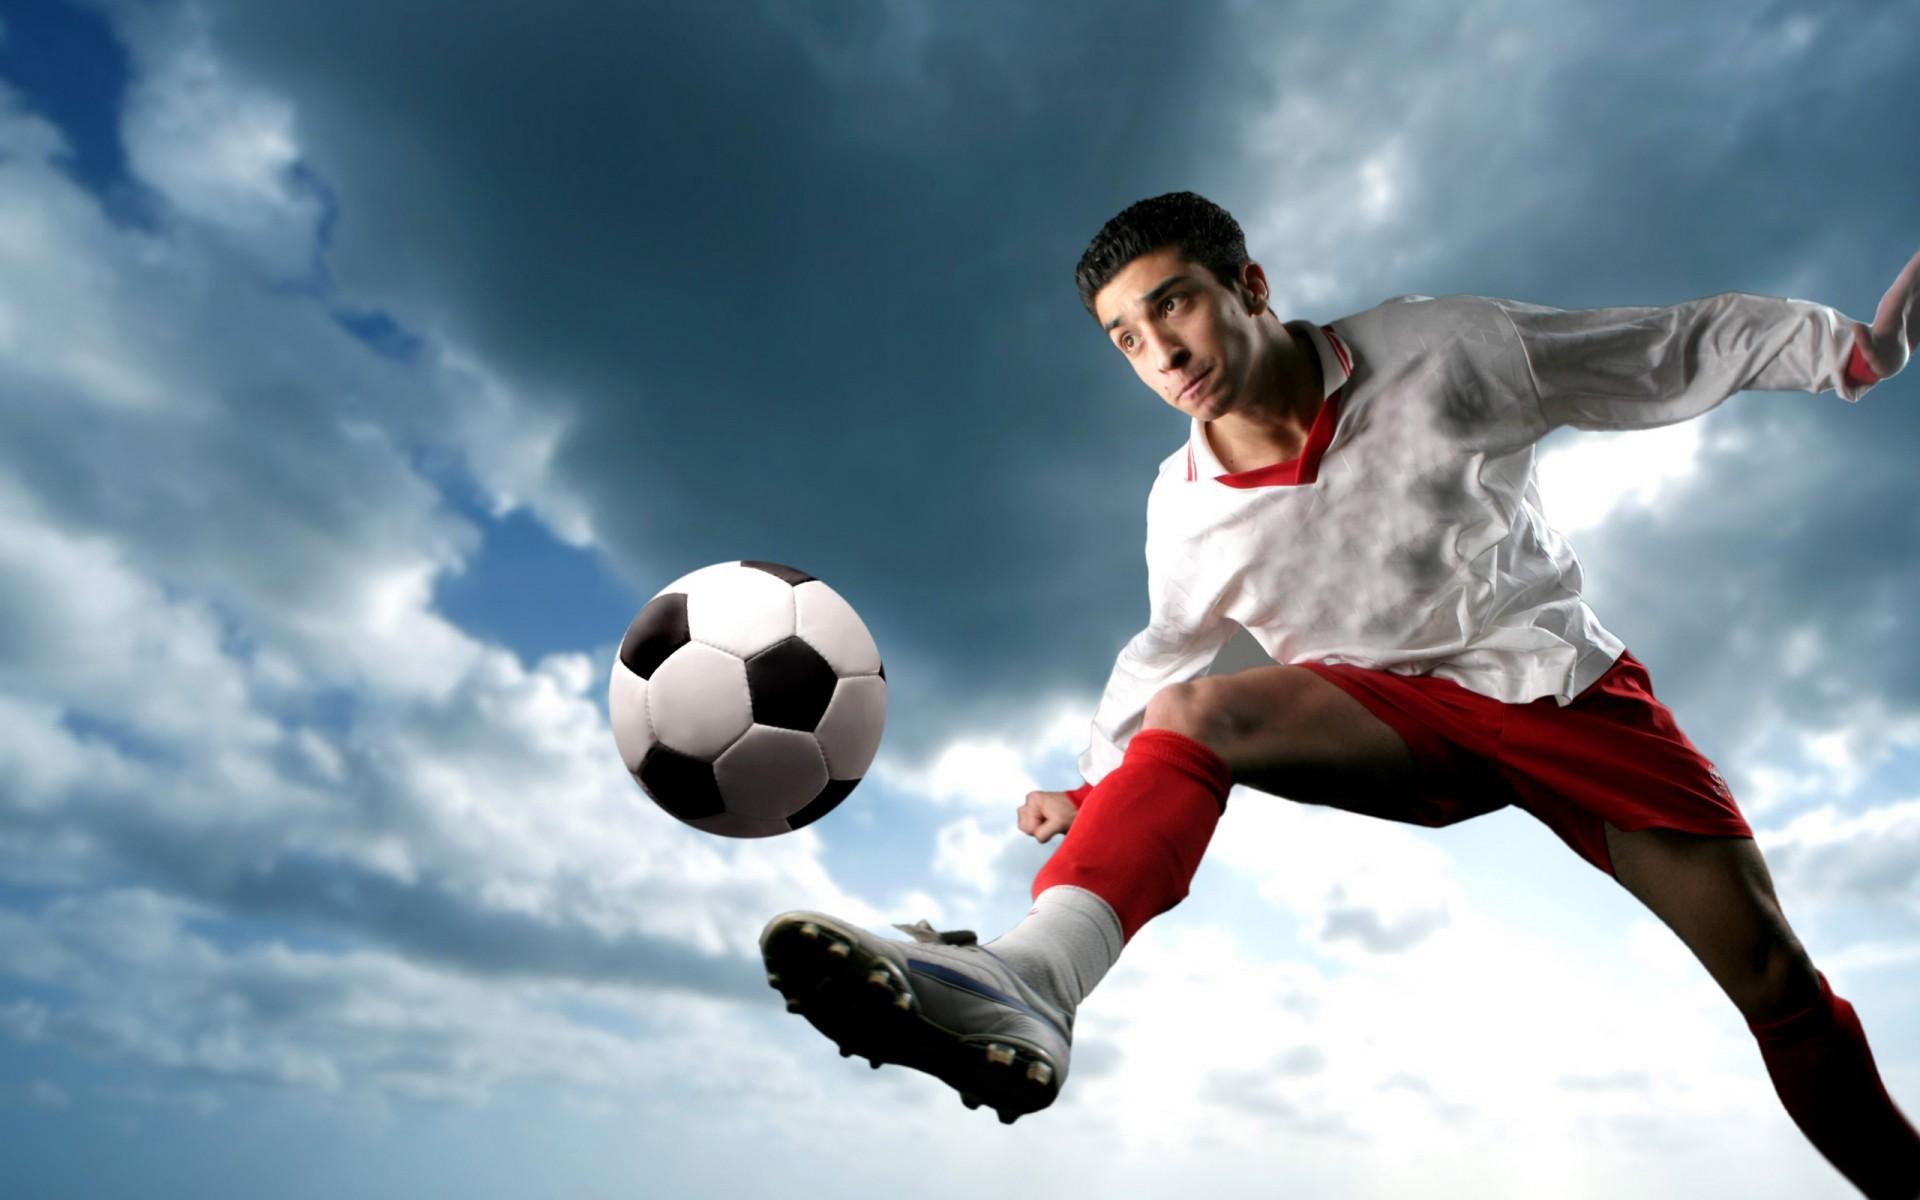 Спорта картинки на компьютер